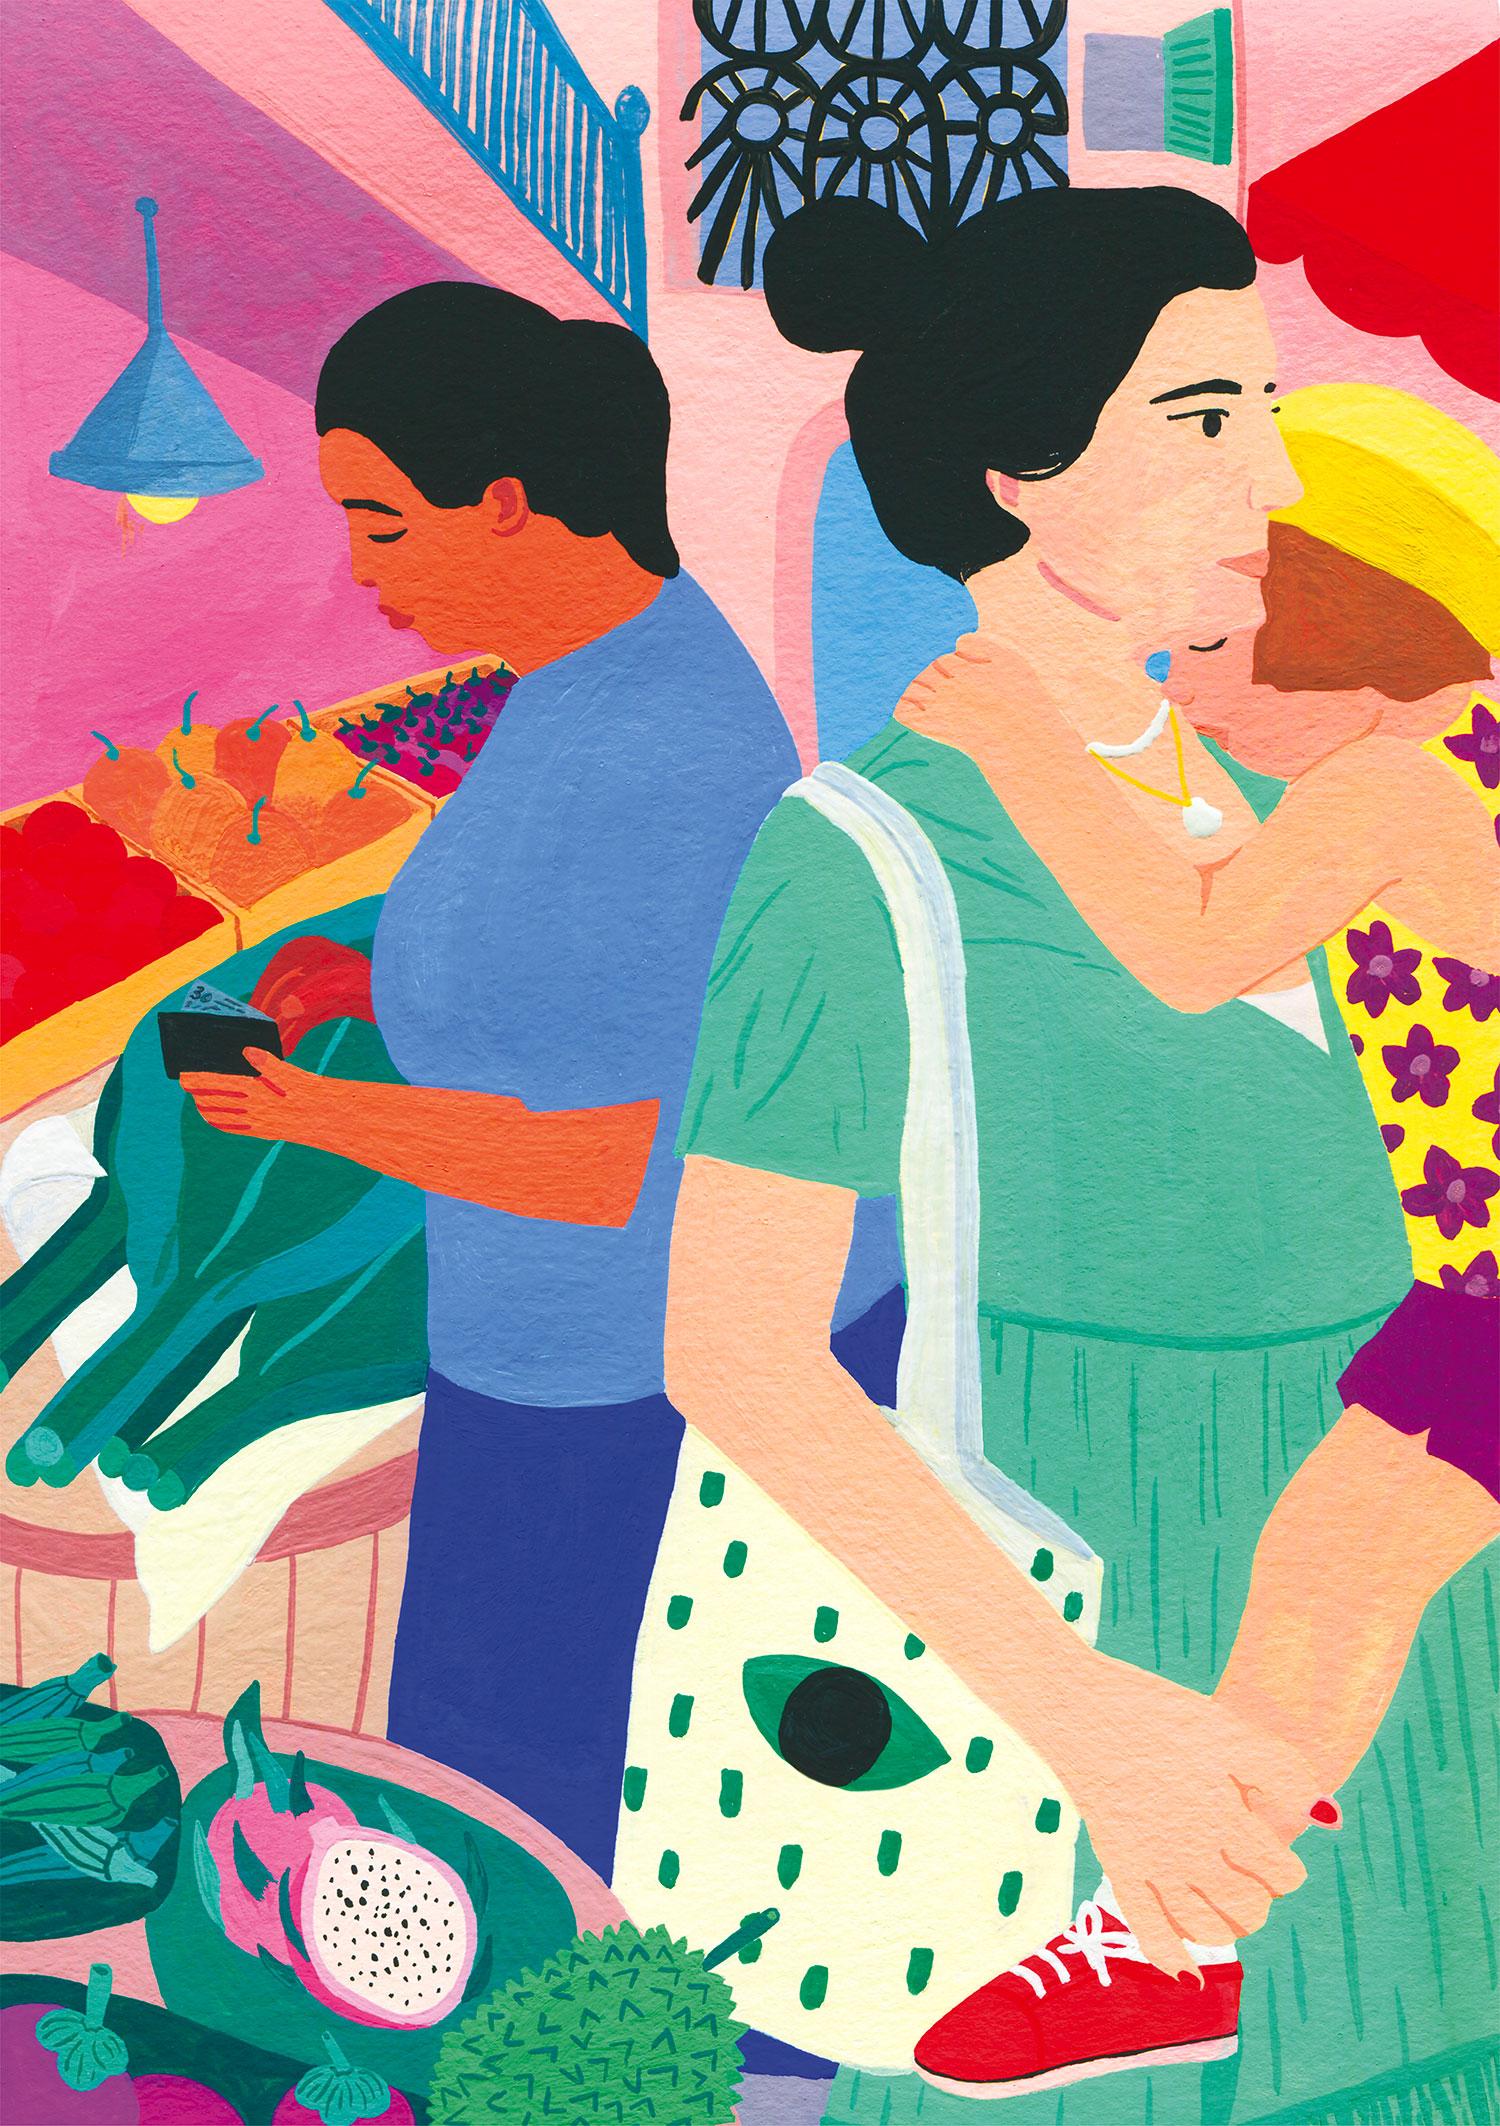 illustration-mariepellet-illustratrice-gouache-projet-personnel-bangkok-market-mère-fille-voyage-vacances